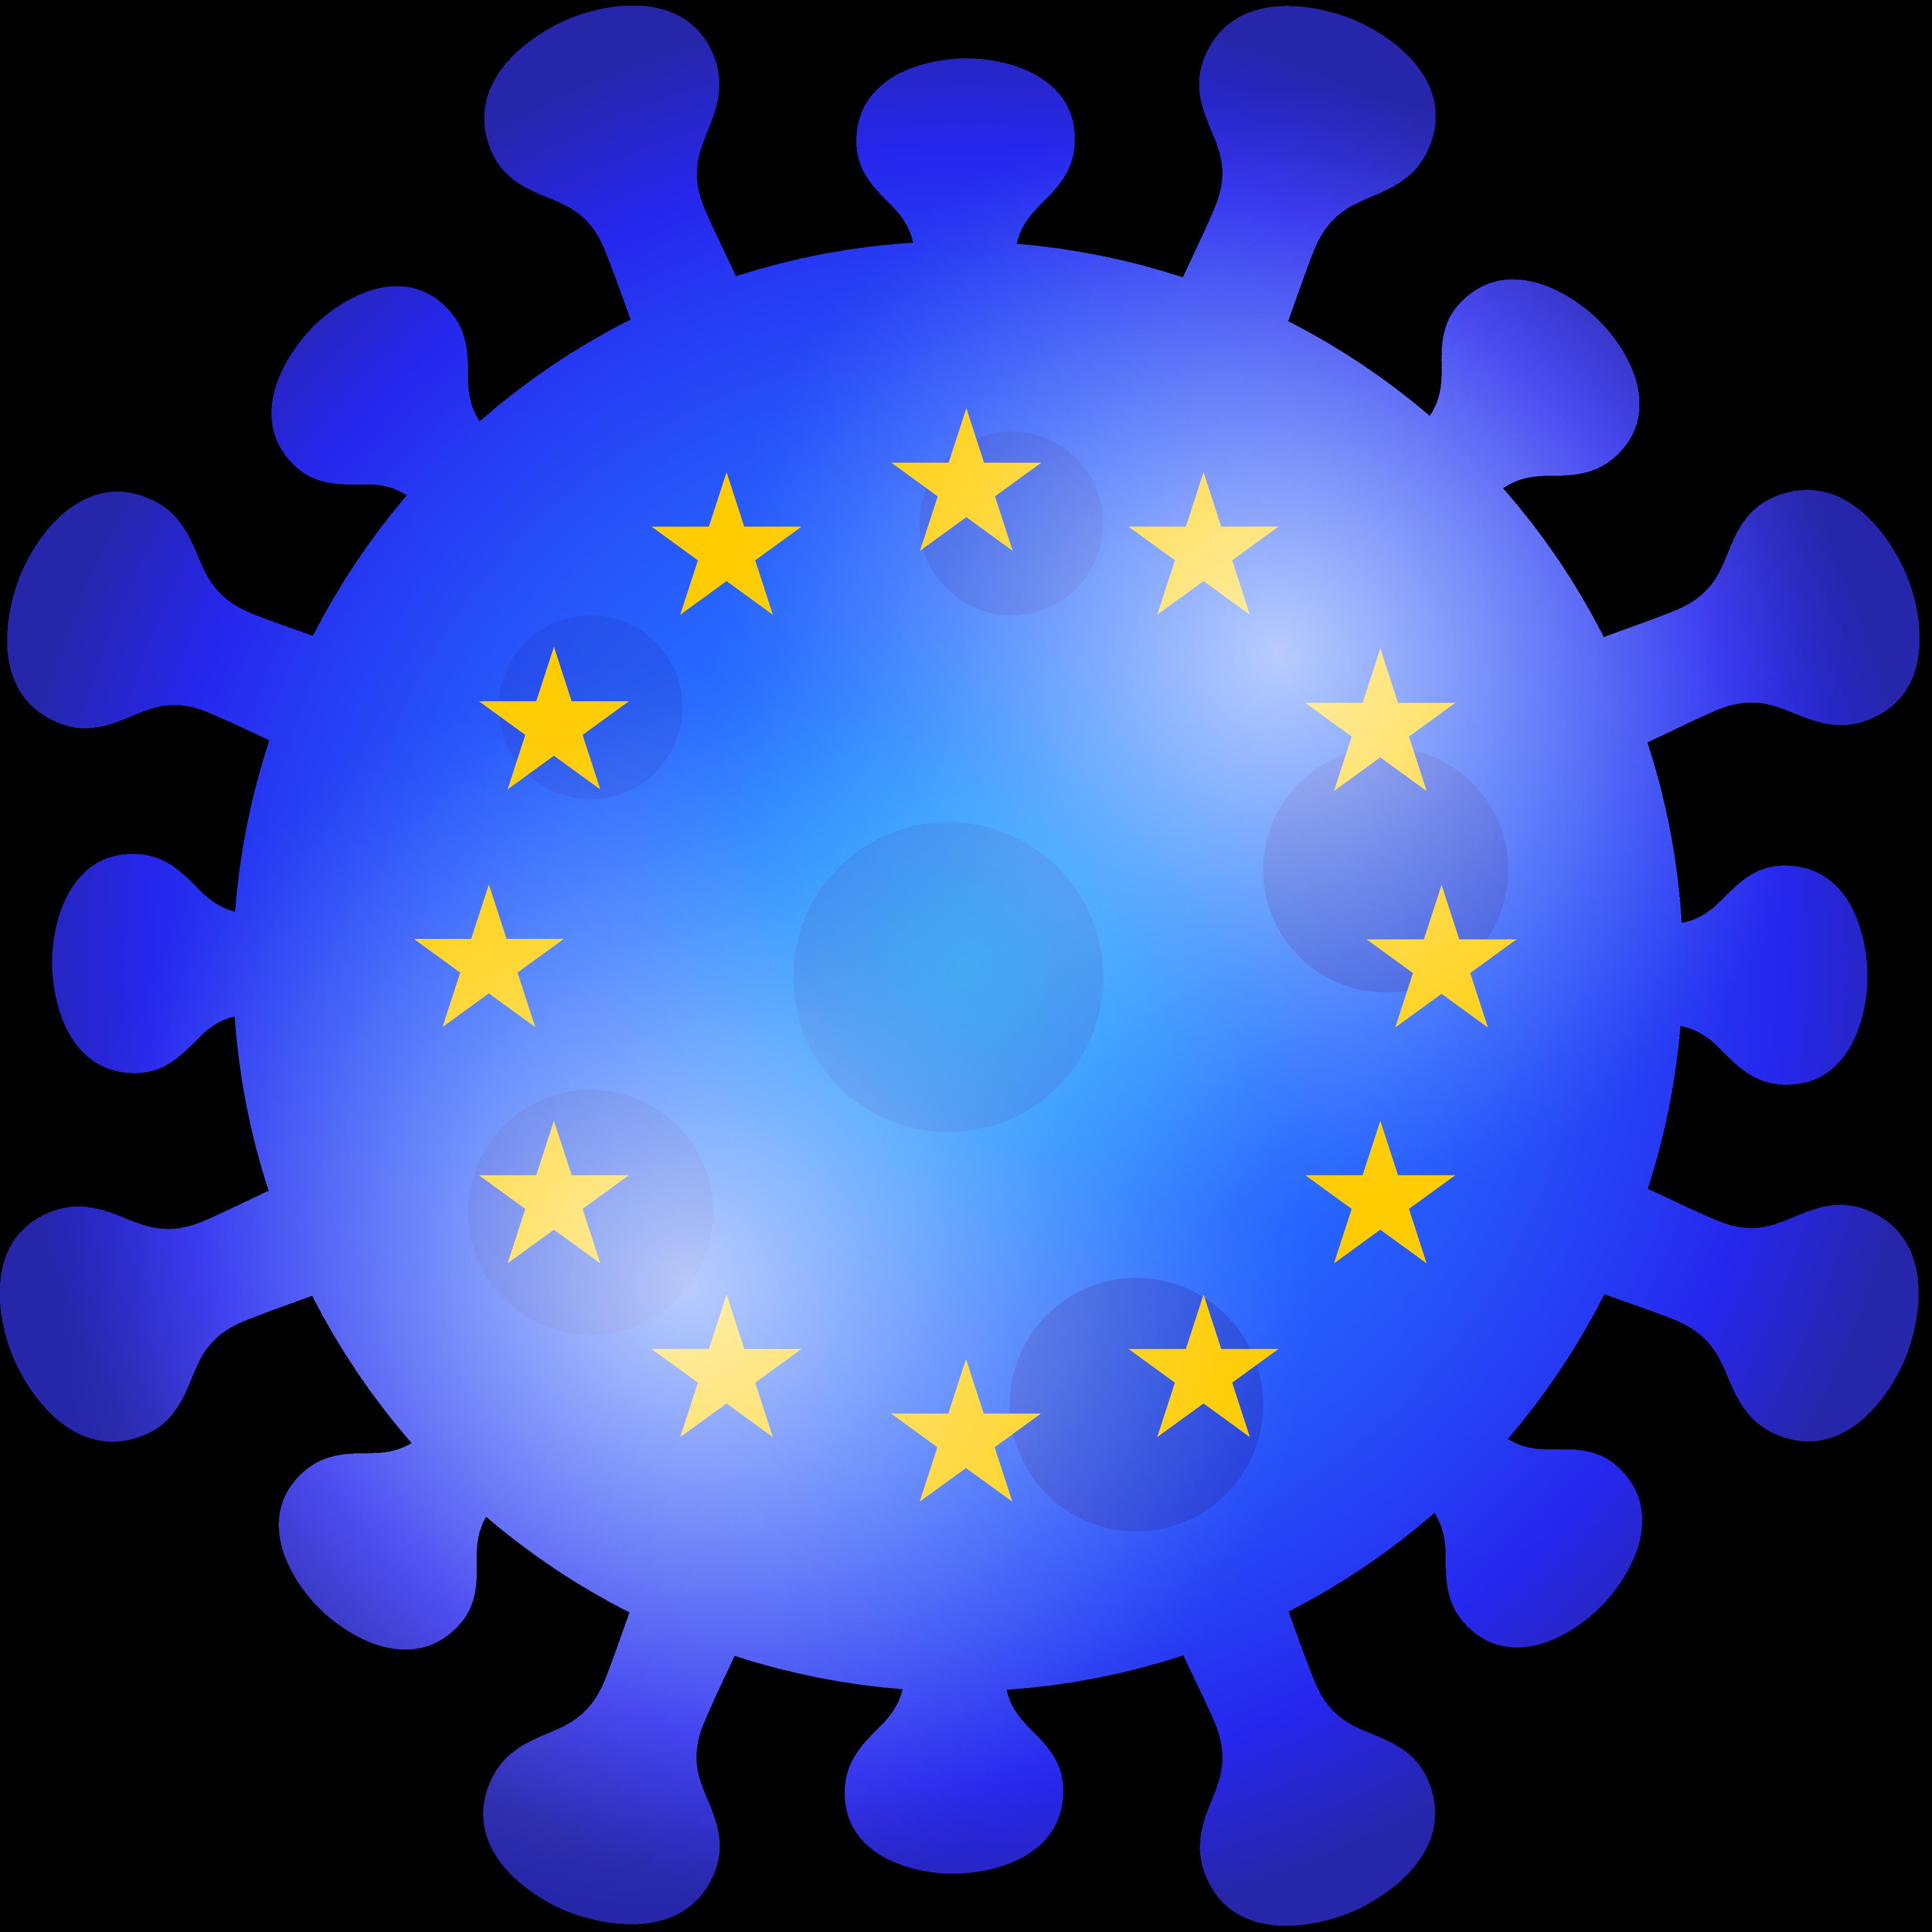 Gratis Download von iXimus.de: Europa Corona-Virus, Icon, 3D, blau, Symbolbild, freigestellt, #000324